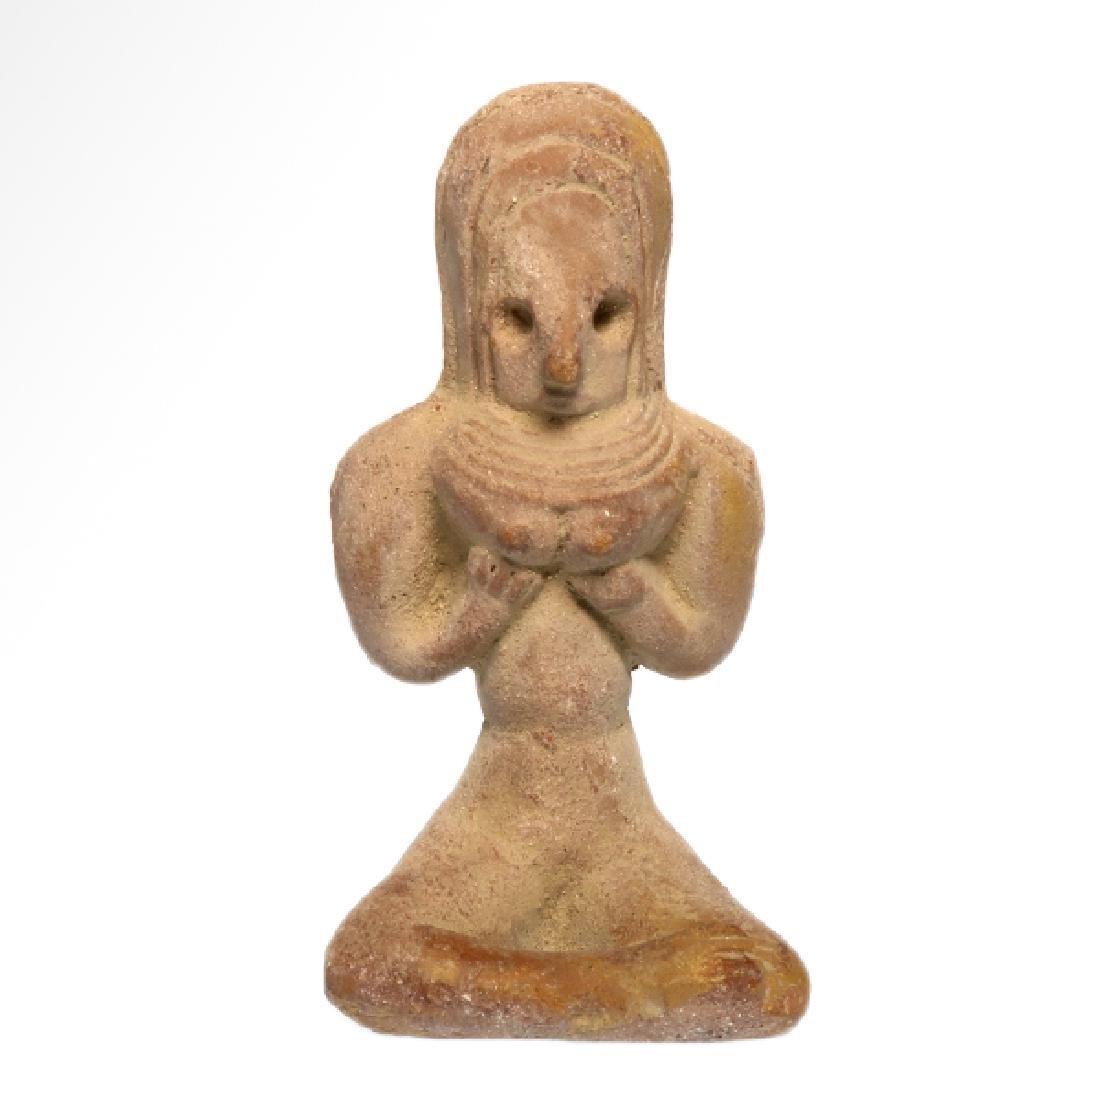 Indus-Valley Mother Goddess, Harappan, c. 2400 B.C.